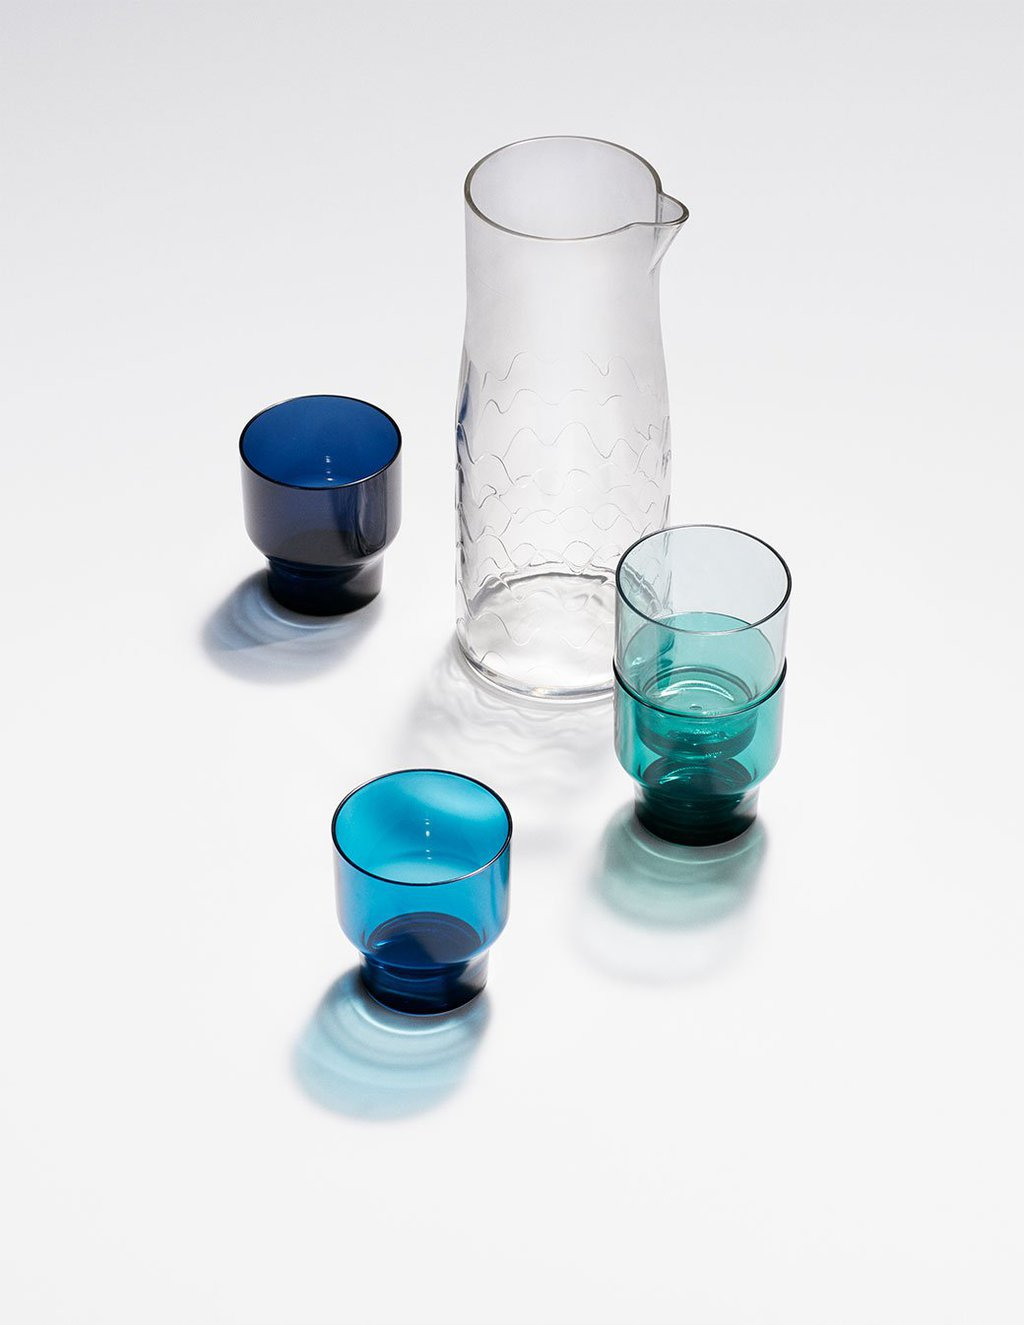 Marimekko for Target stackable glassware via @thouswellblog